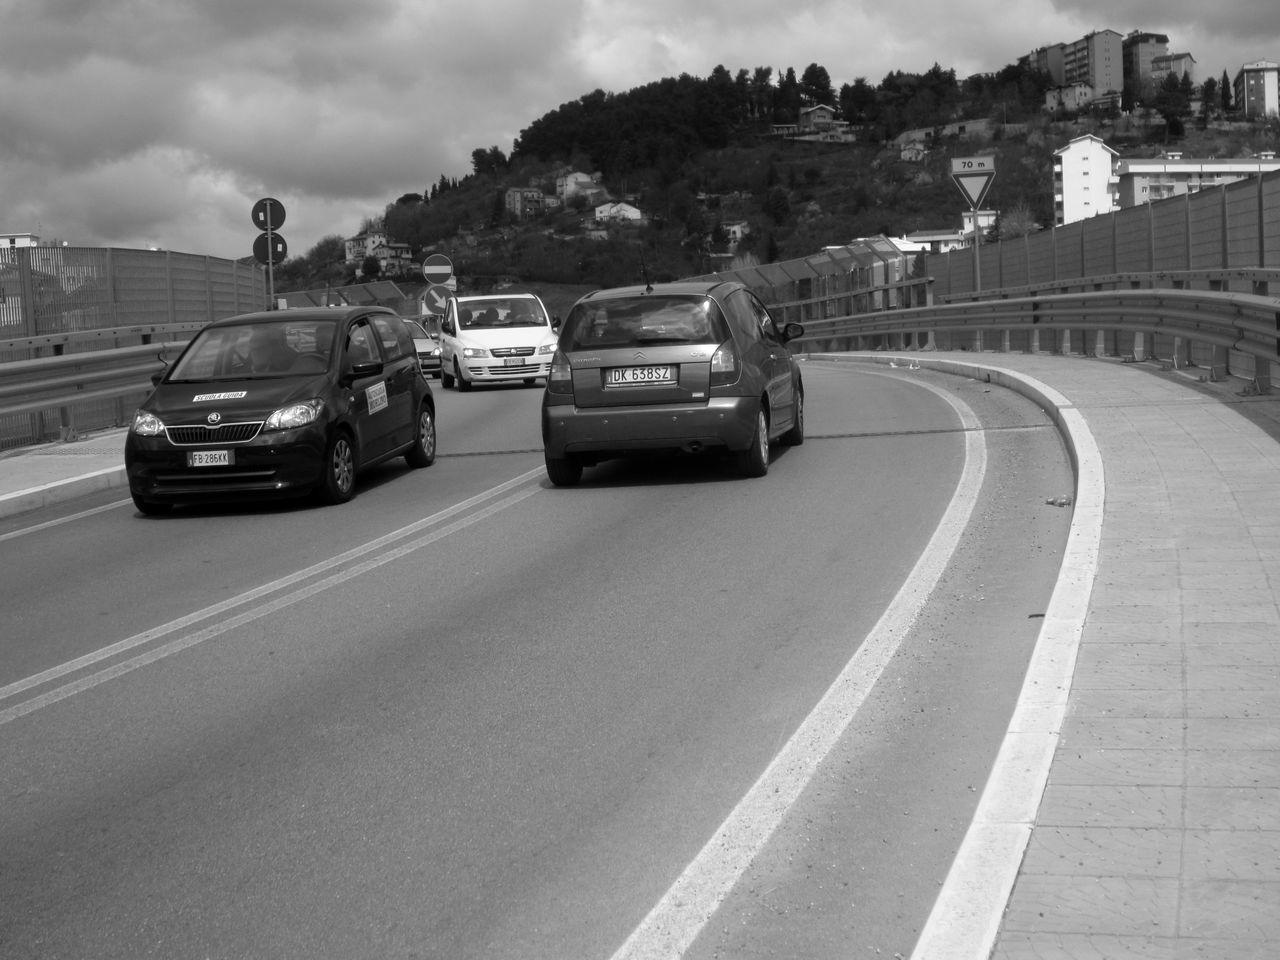 #architecture #basilicata #Black&White #blackandwhite #fotobiancoenero #fotobianconero #Italia #italy #lucania #urbanphotography #vialedelbasento Potenzainferiore